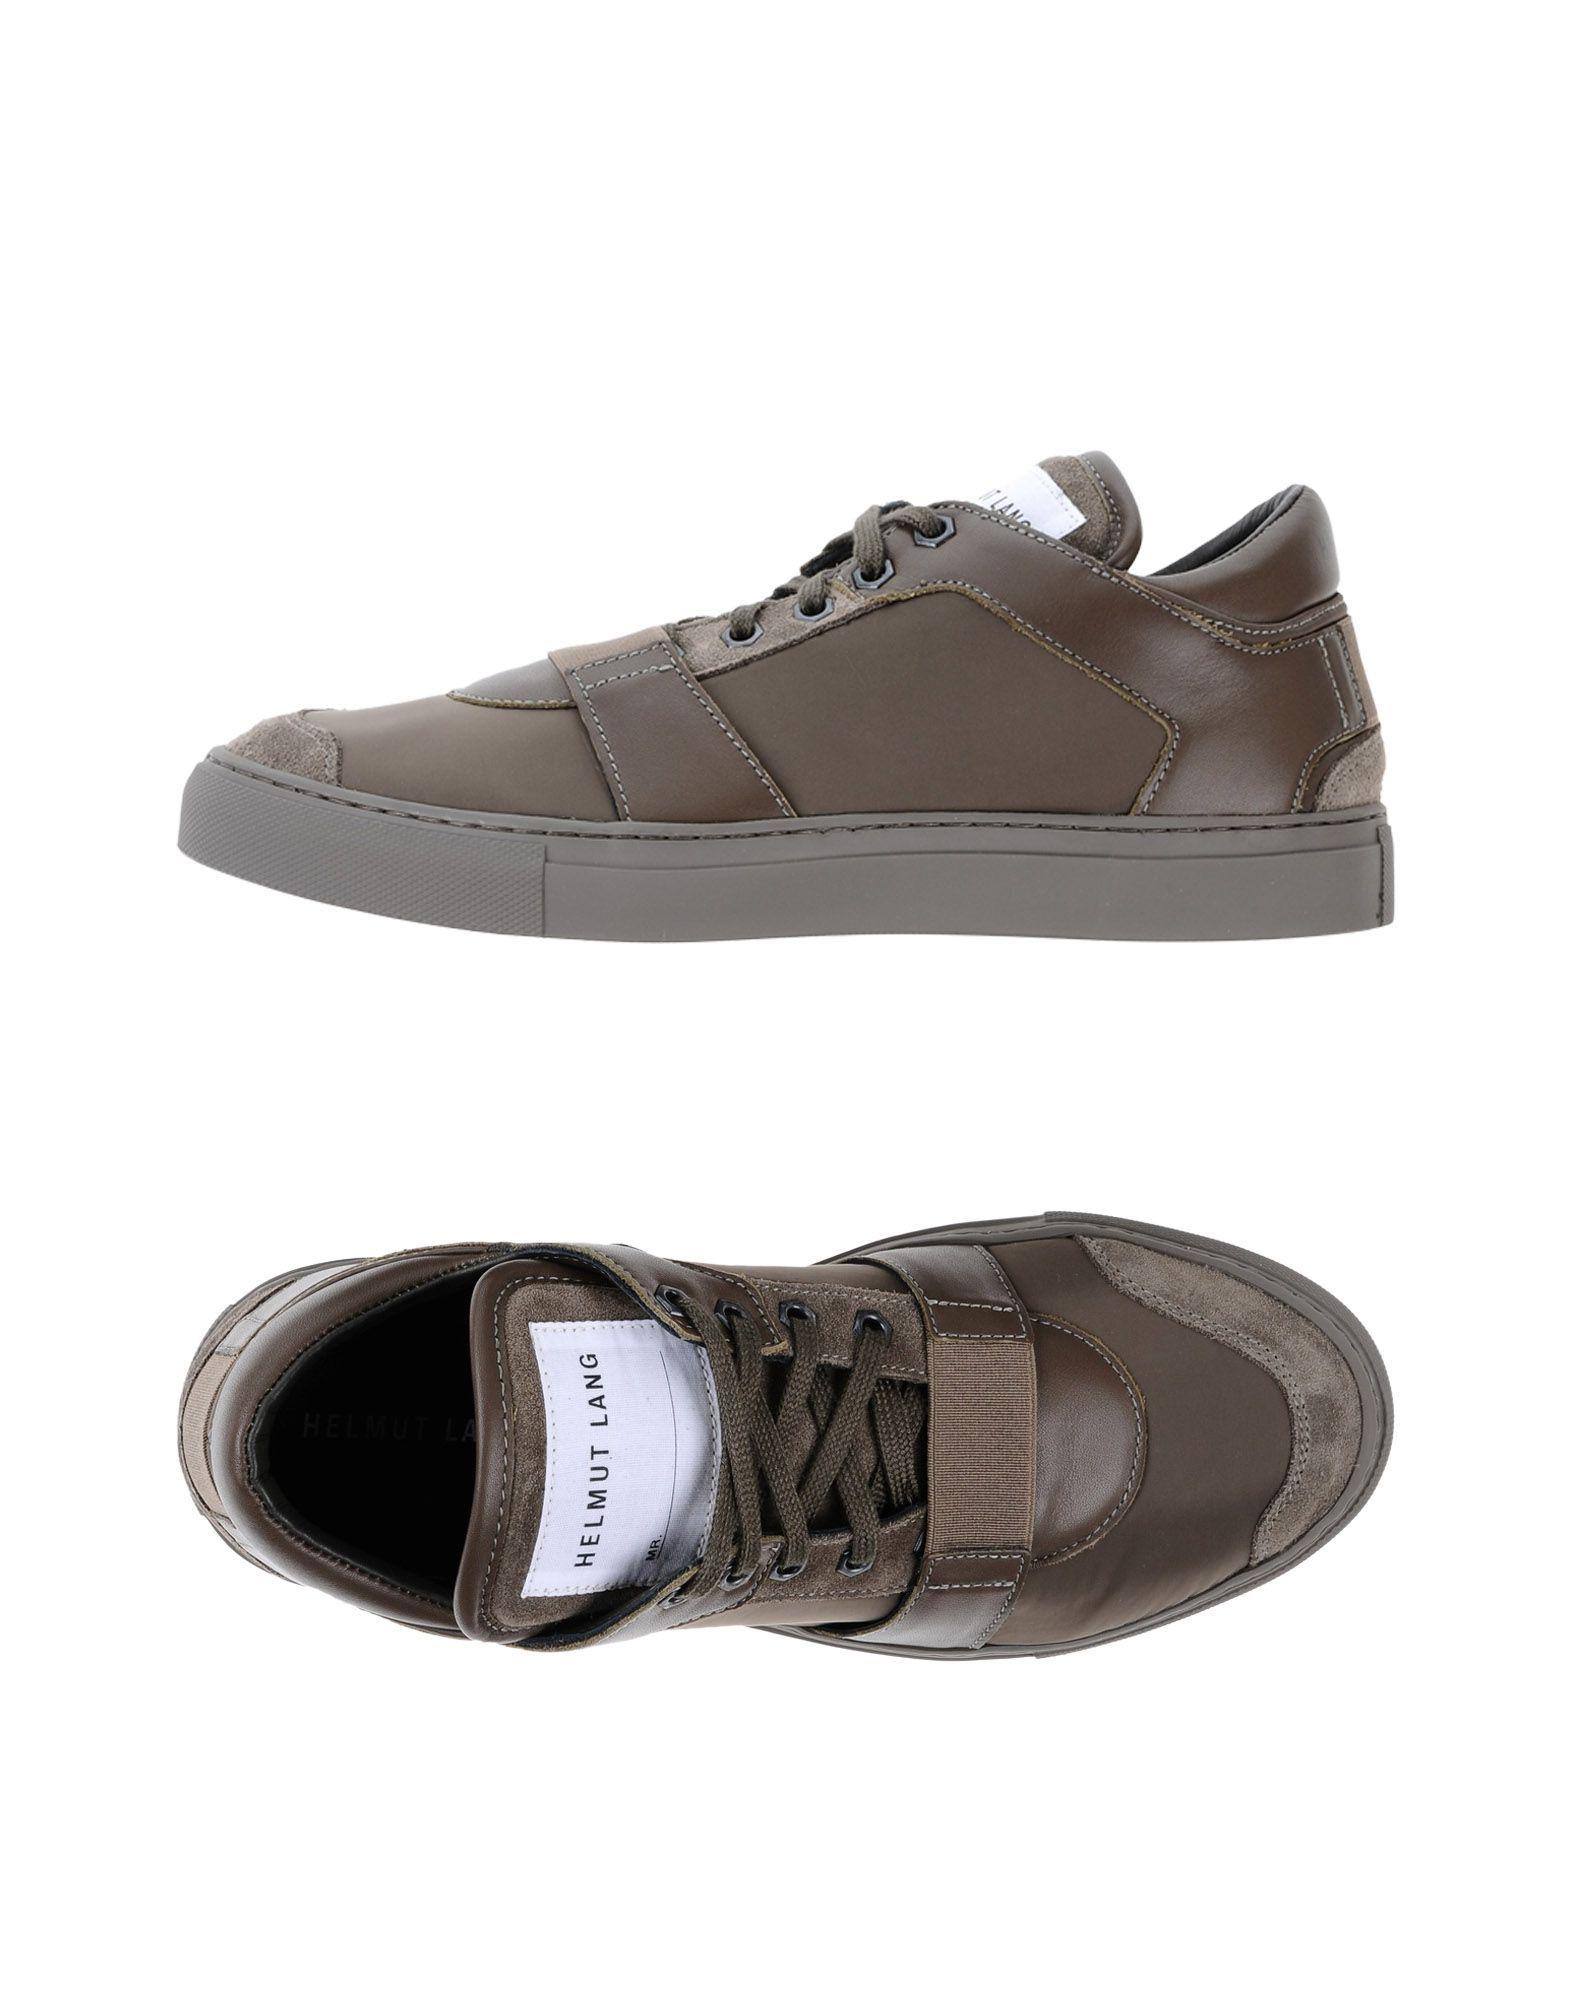 HELMUT LANG Низкие кеды и кроссовки | Sneakers, Light brown